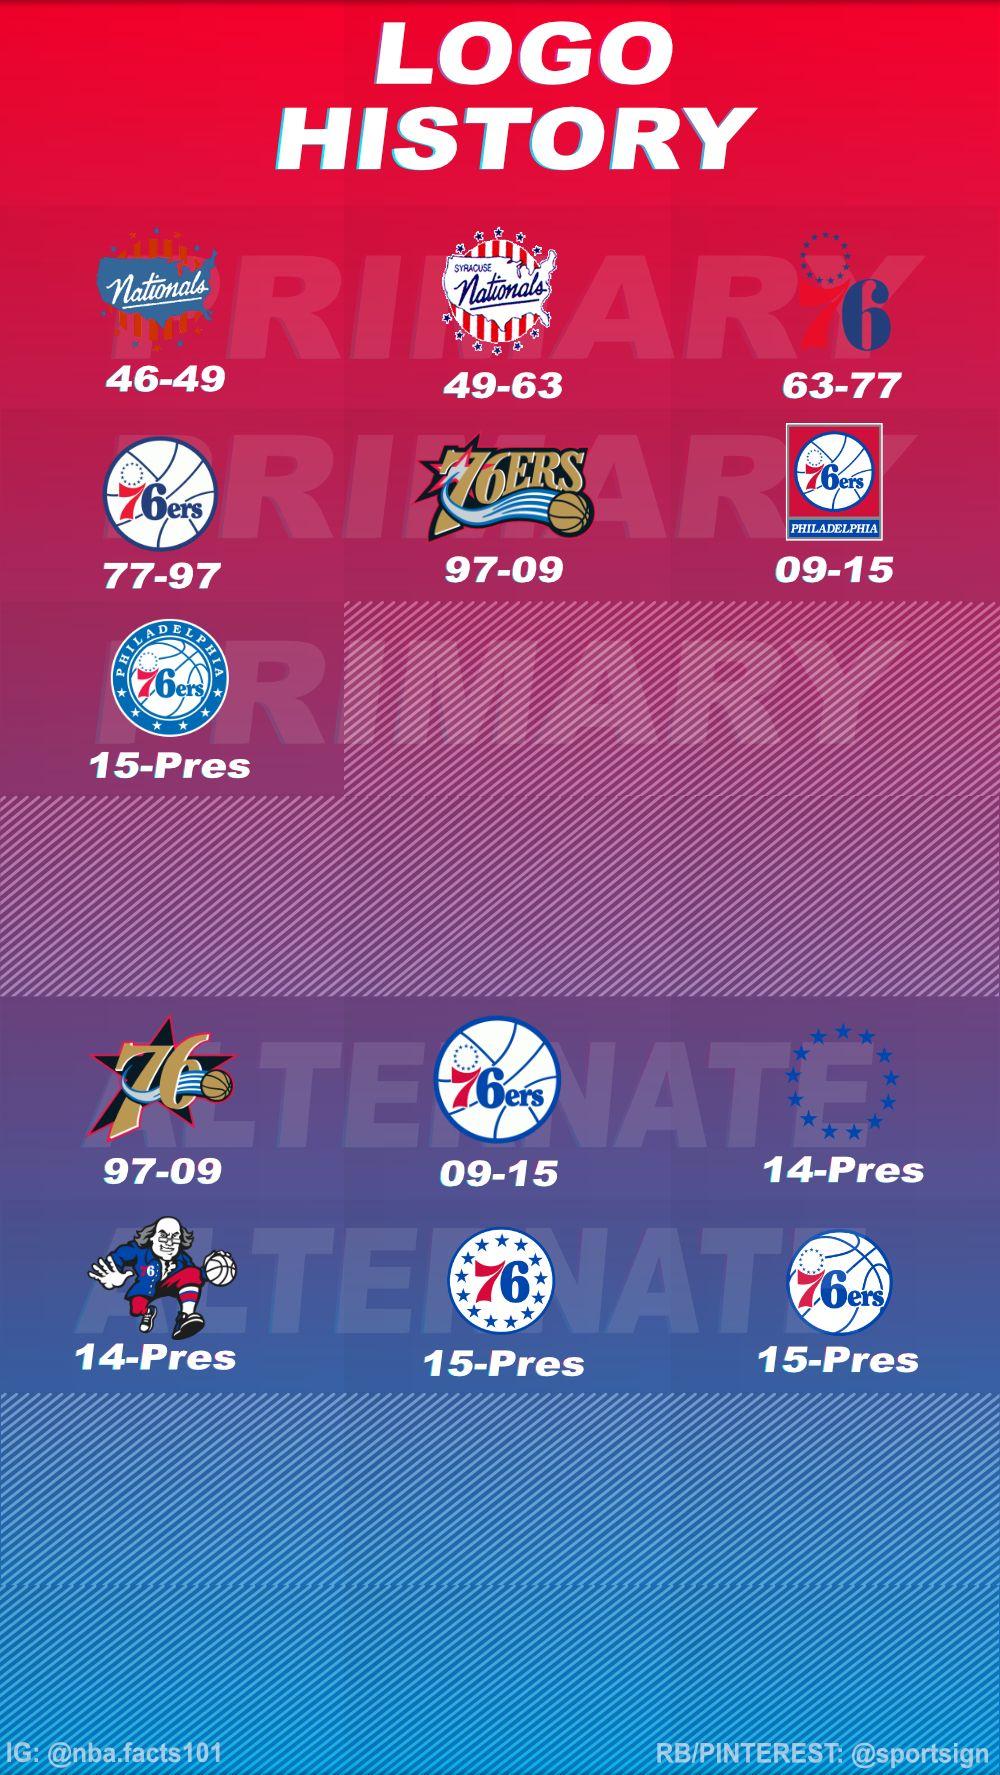 History of the NBA Basketball Team Philadelphia 76ers